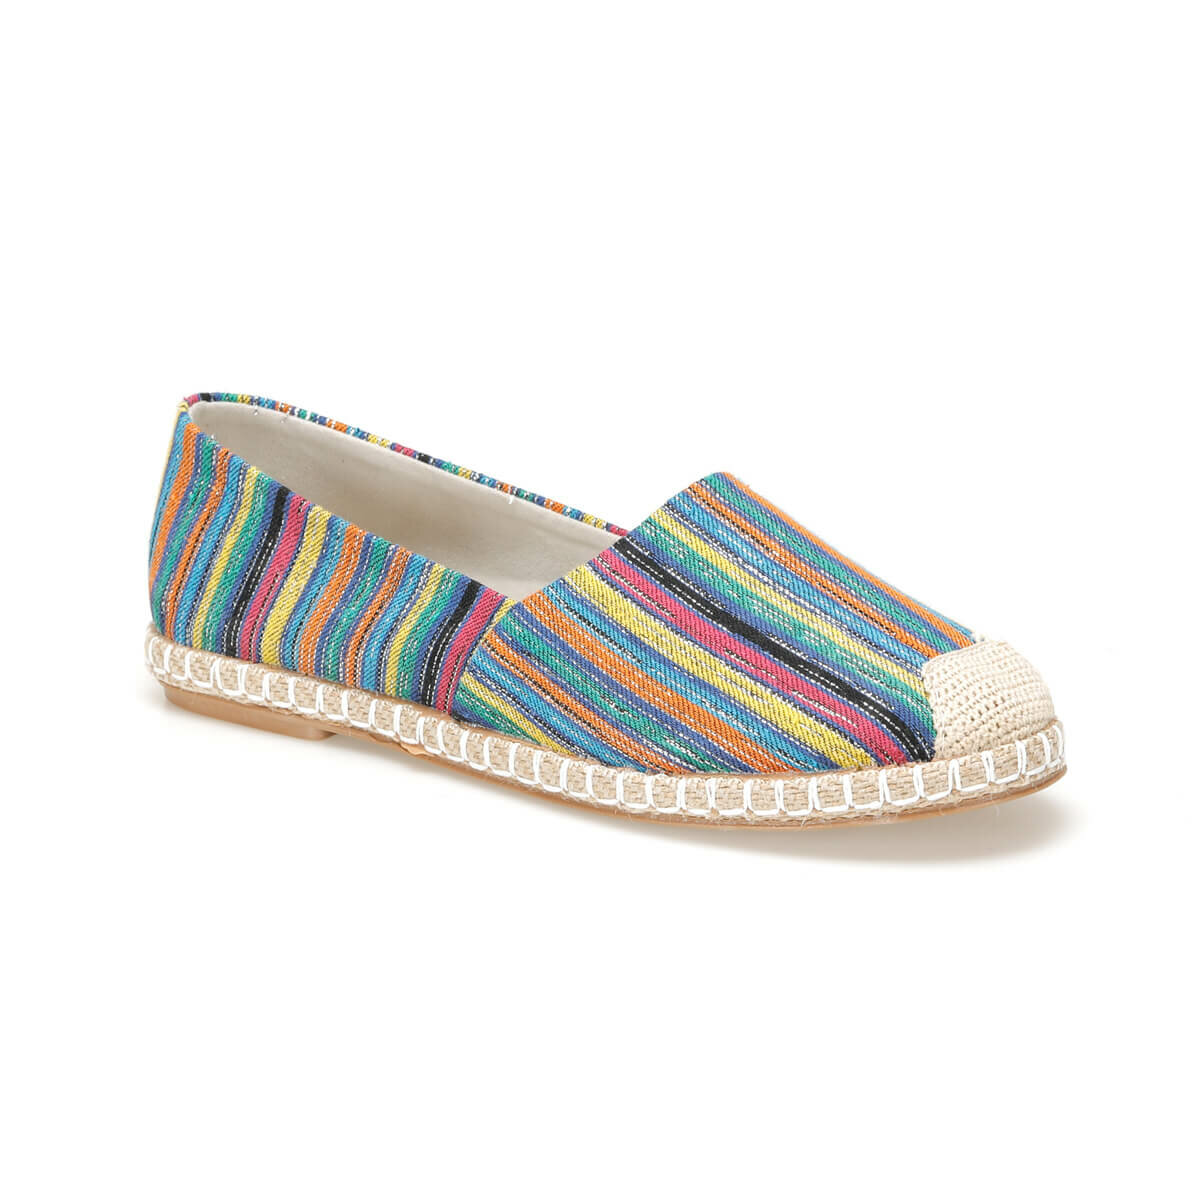 FLO OKOCHA98Z Multicolour Women Espadril Shoes BUTIGO